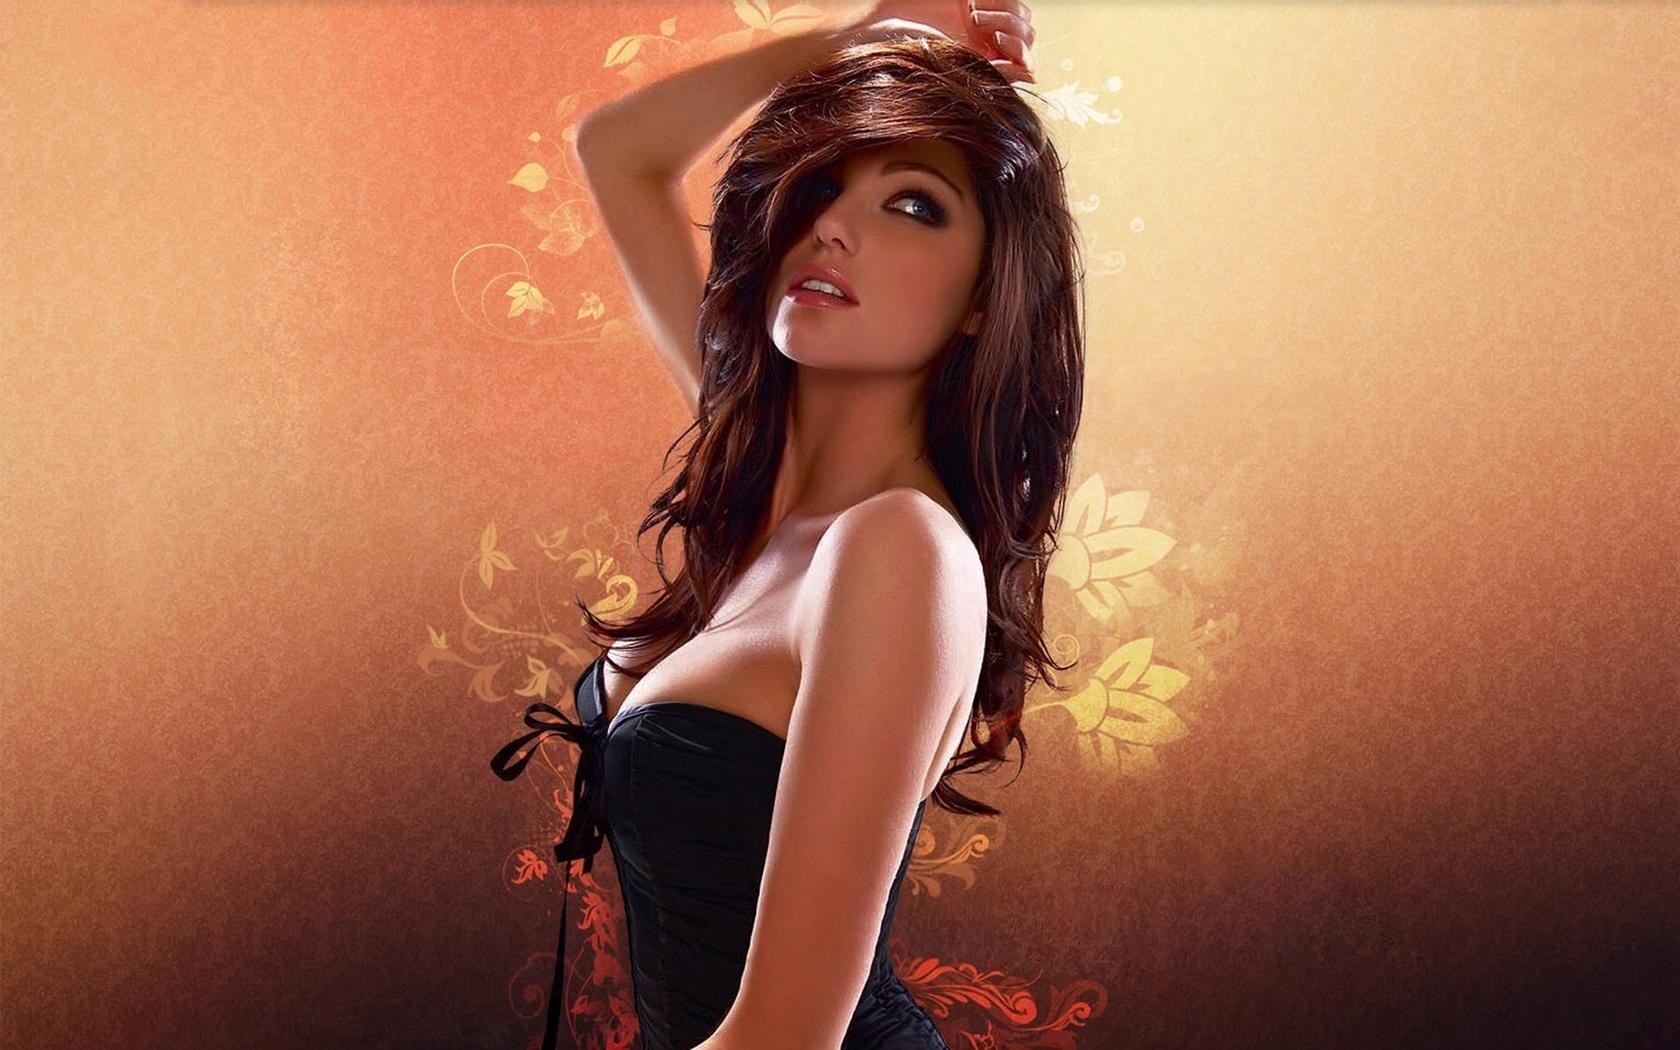 Free sexy ass girlshd wallpapers desktop background porn pics